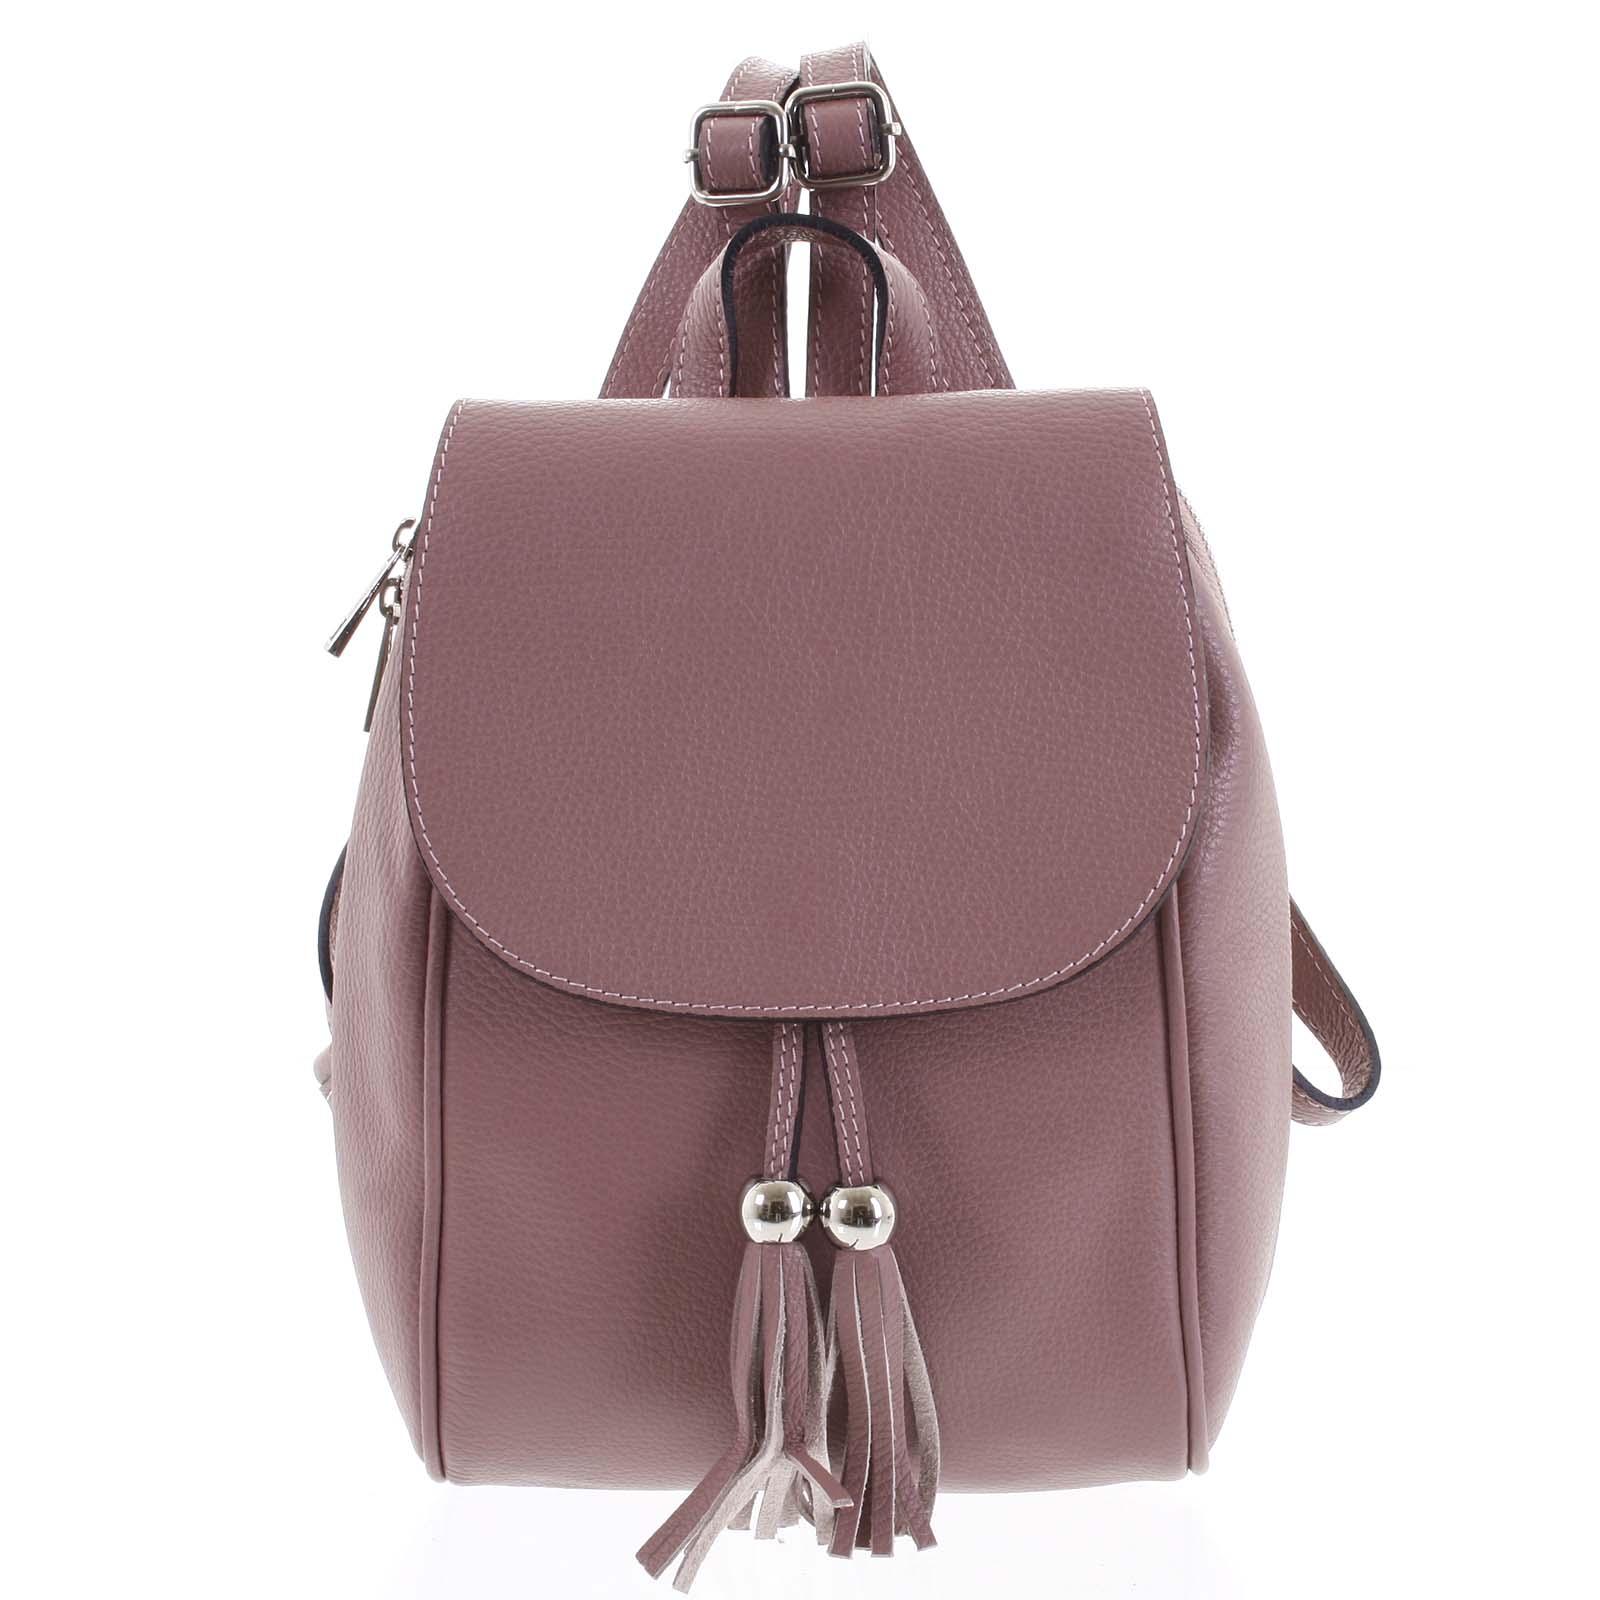 Dámský kožený batůžek tmavě růžový - ItalY Joseph